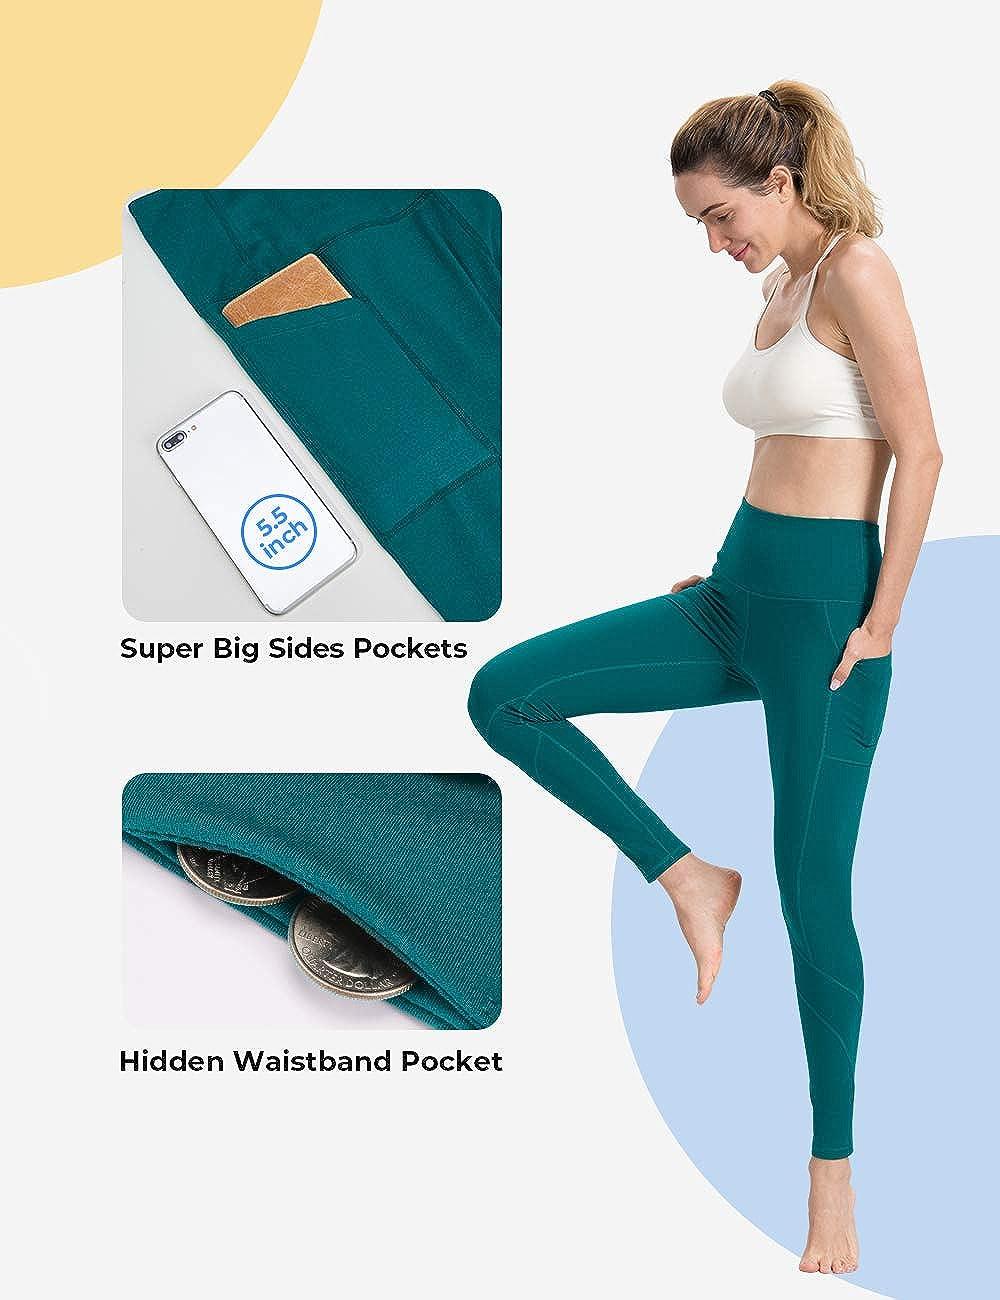 Womens Yoga Pants New York Art Design Art Gift Ideas Yellow Super Soft Yoga Leggings with Pockets